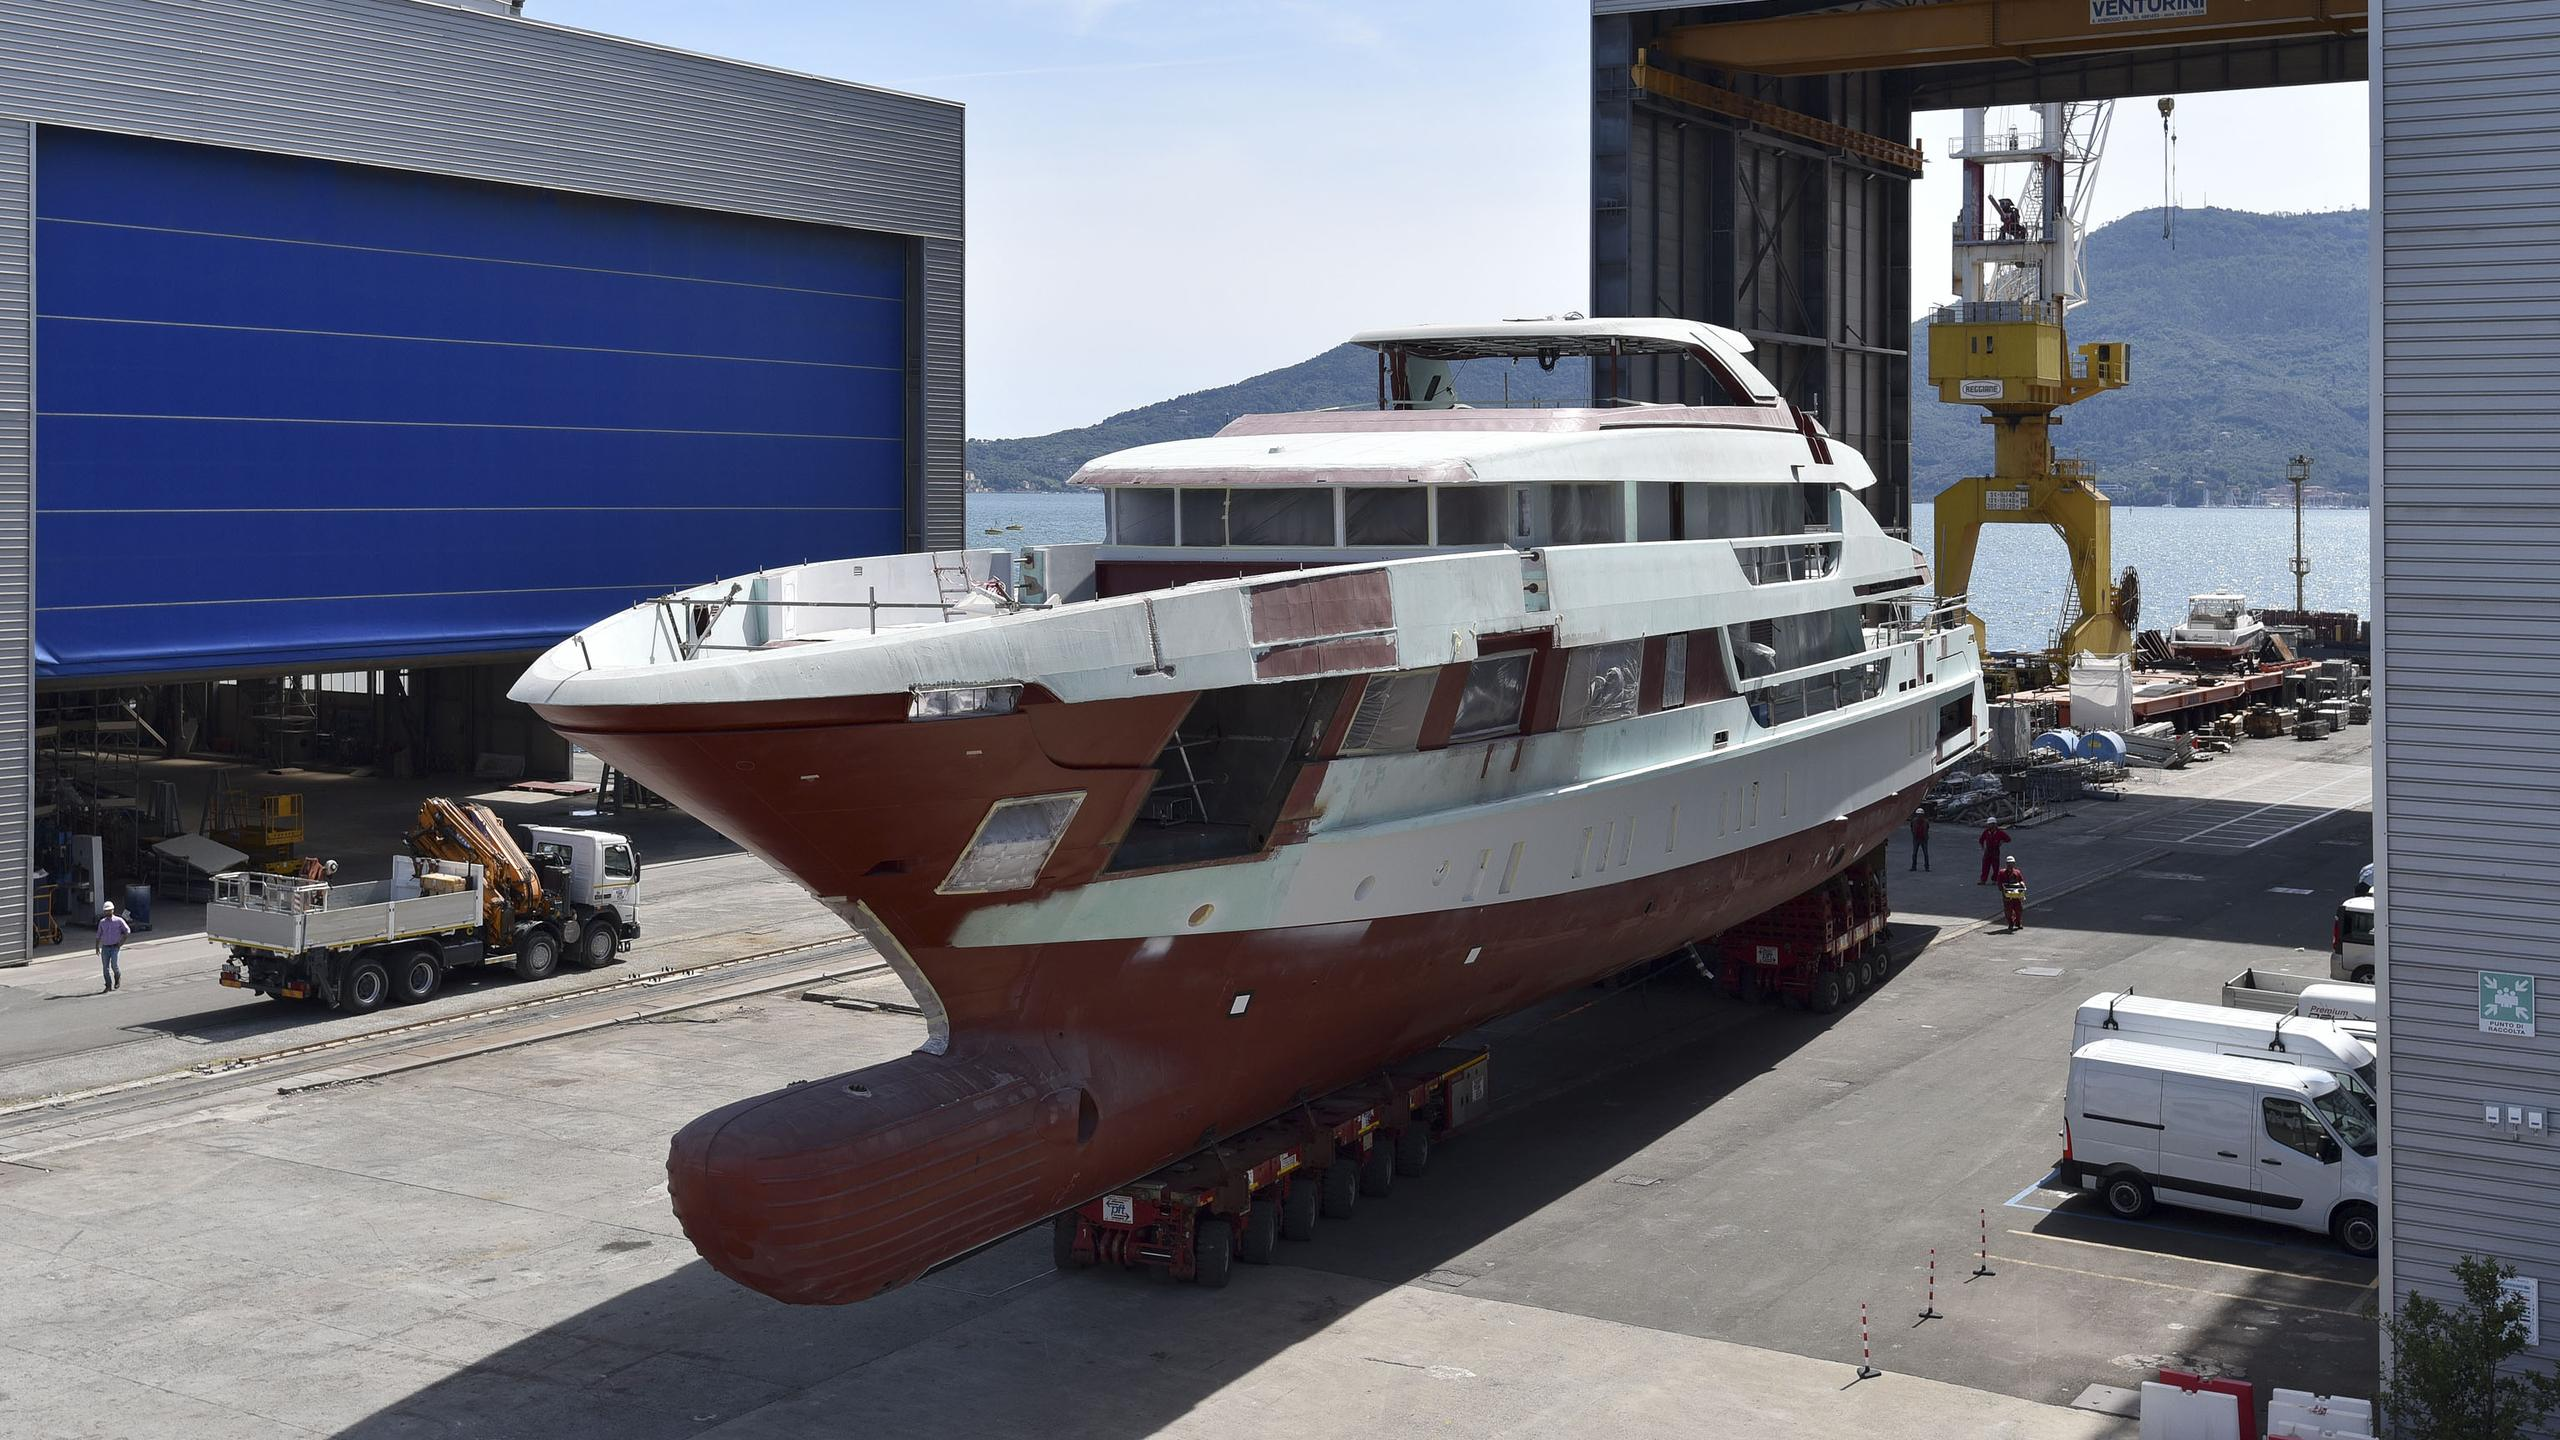 kd motoryacht sanlorenzo 52 steel 2018 52m shipyard under construction profile